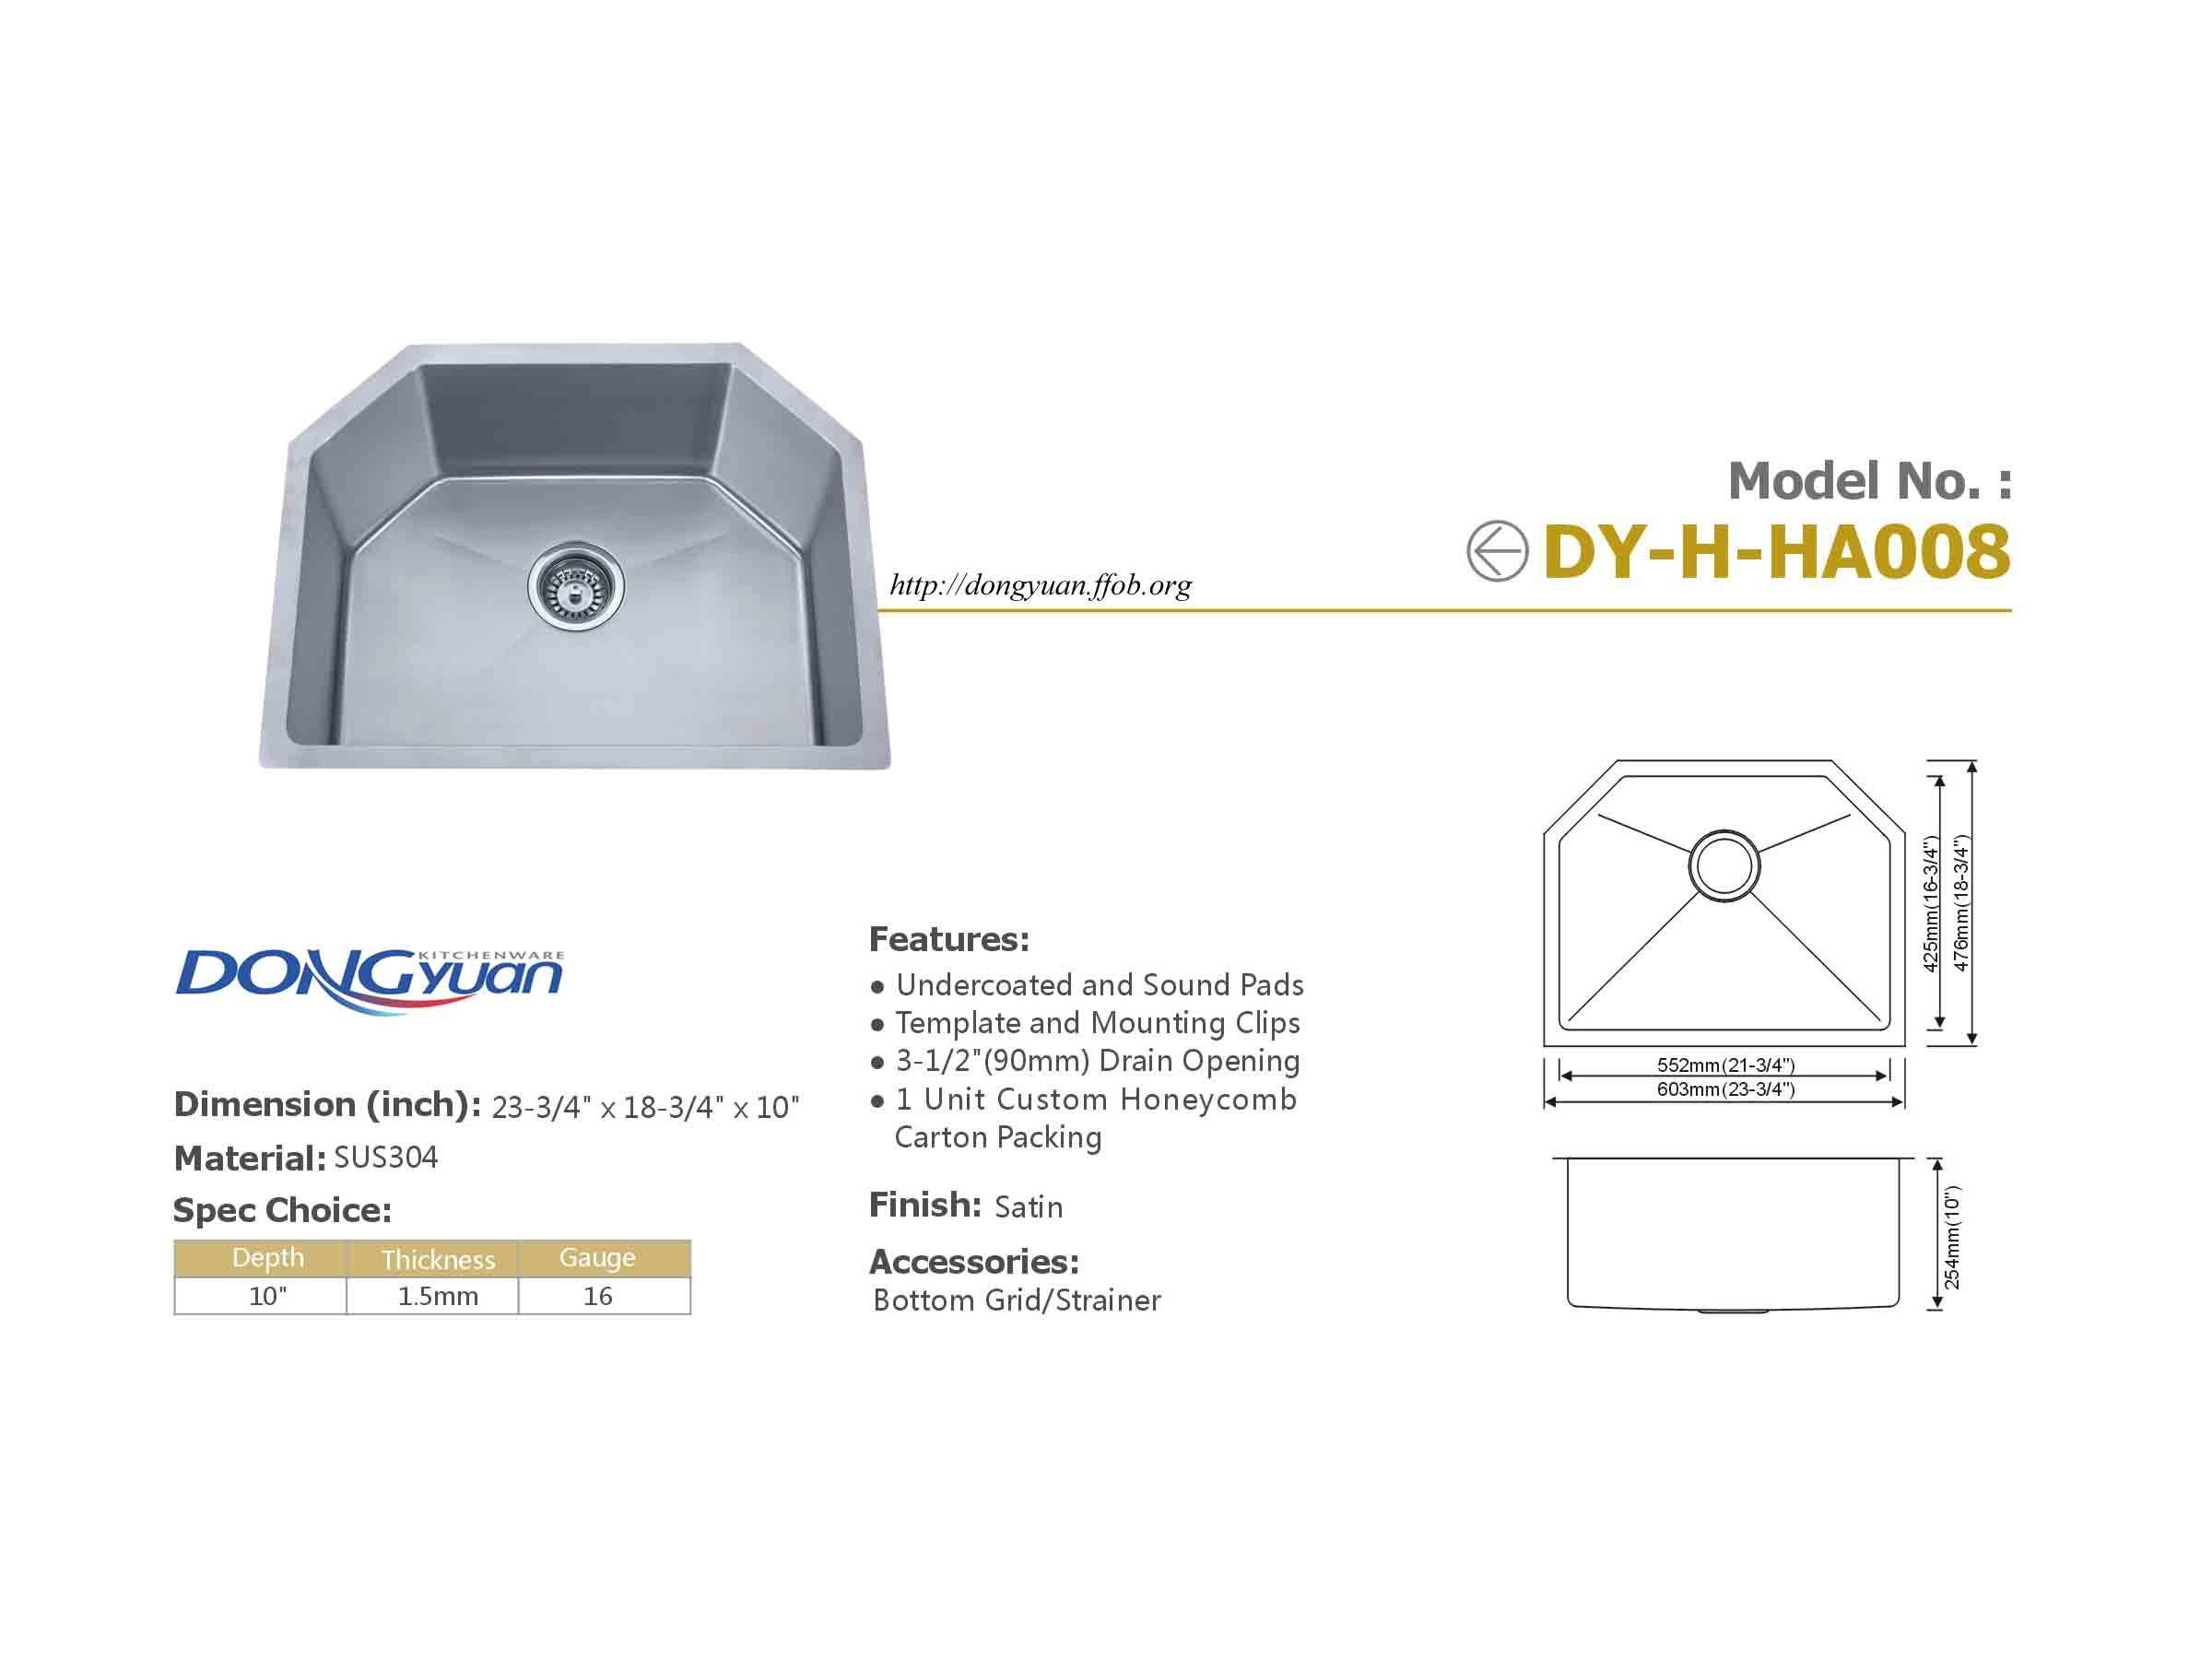 Dongyuan 24 Inch 304 Stainless Steel 16 Gauge Handmade Single Bowl Kitchen Sink Sink Bathroom Scale Steel